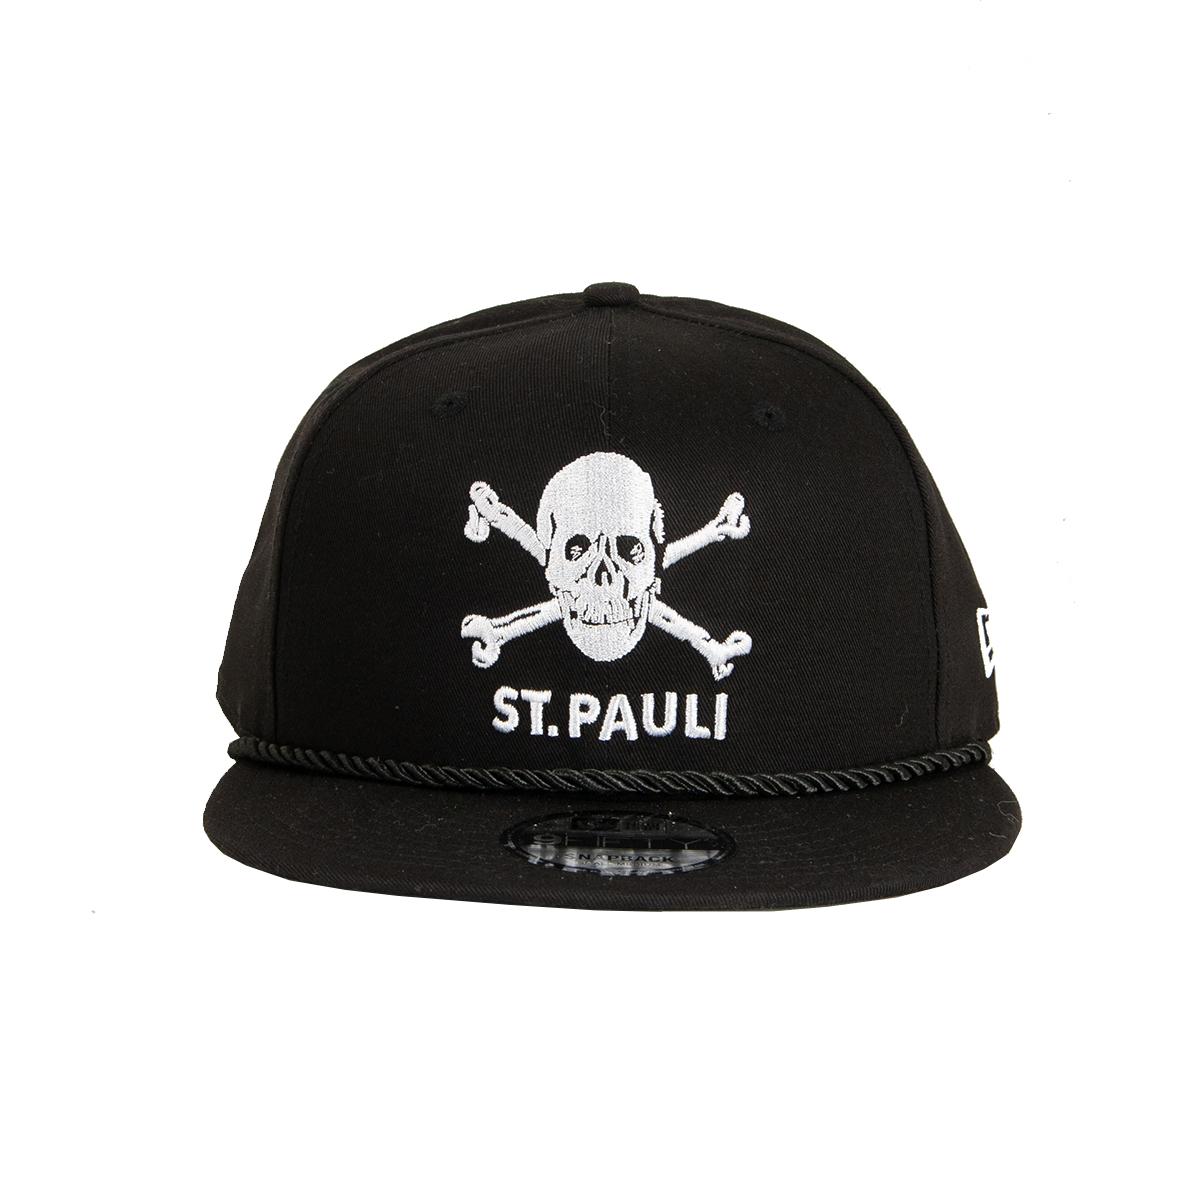 "FC St. Pauli - Cap 9fifty TK ""Kordel"" - schwarz"